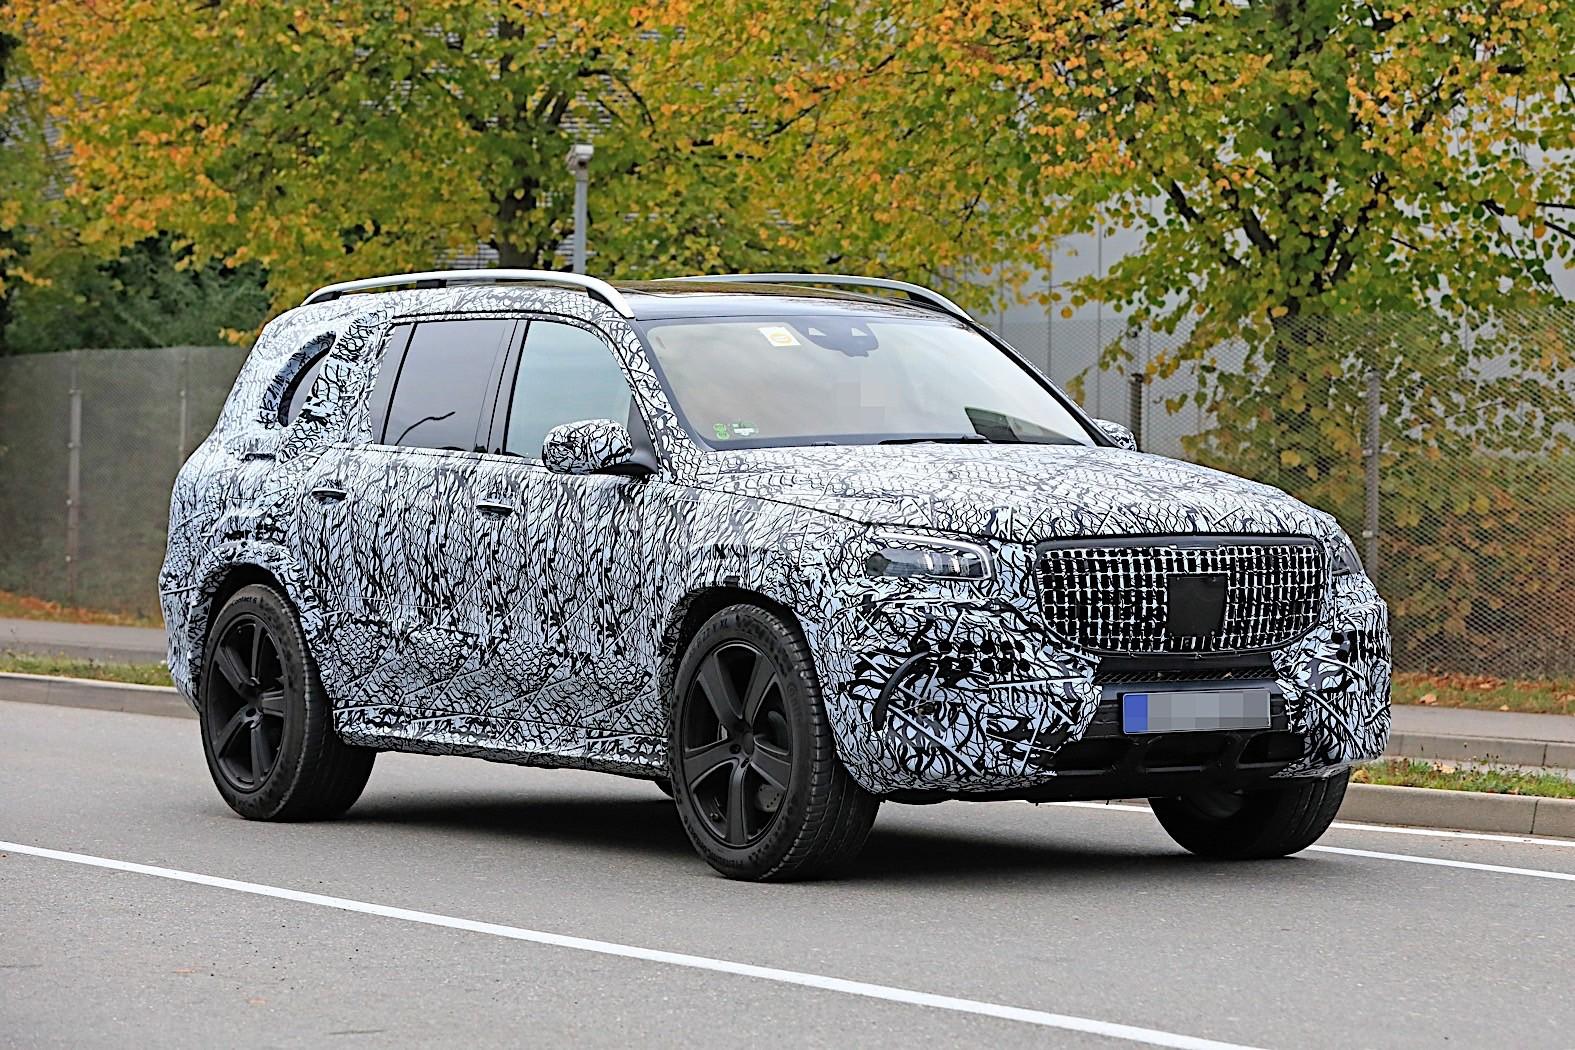 2020 Mercedes-Maybach GLS Meets Mercedes-Benz GLS in Rare ...